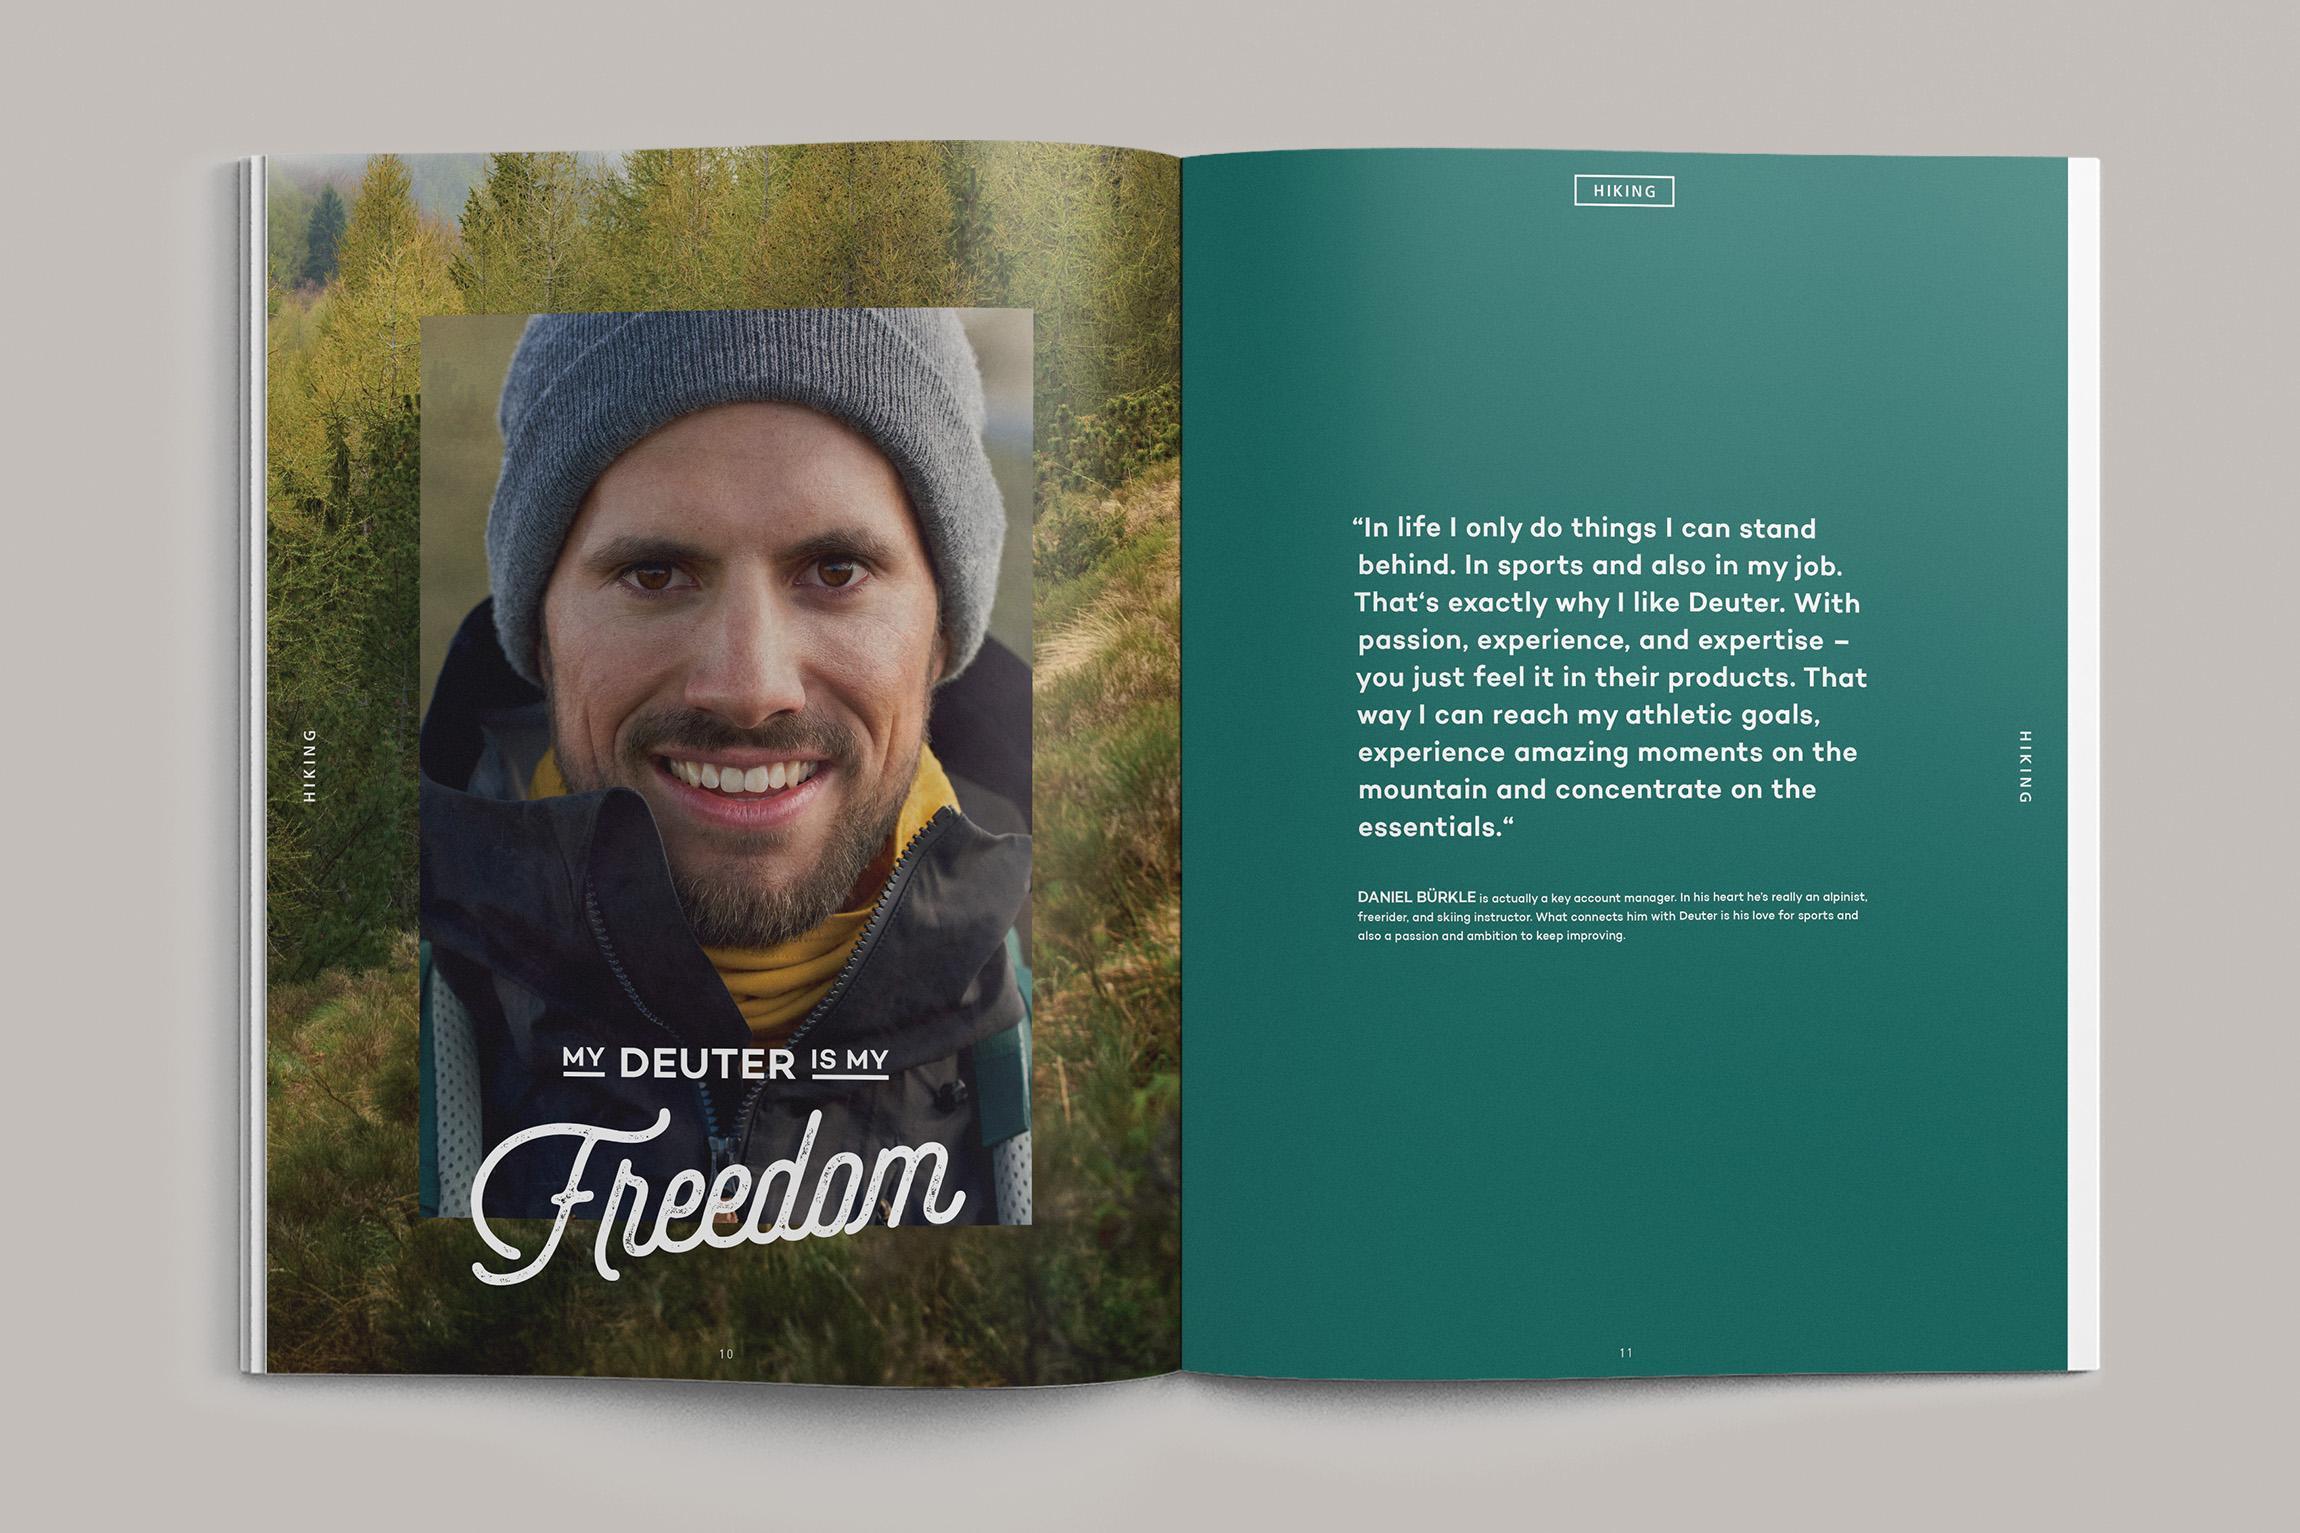 deuter-imagekampagne-magazin-03.jpg